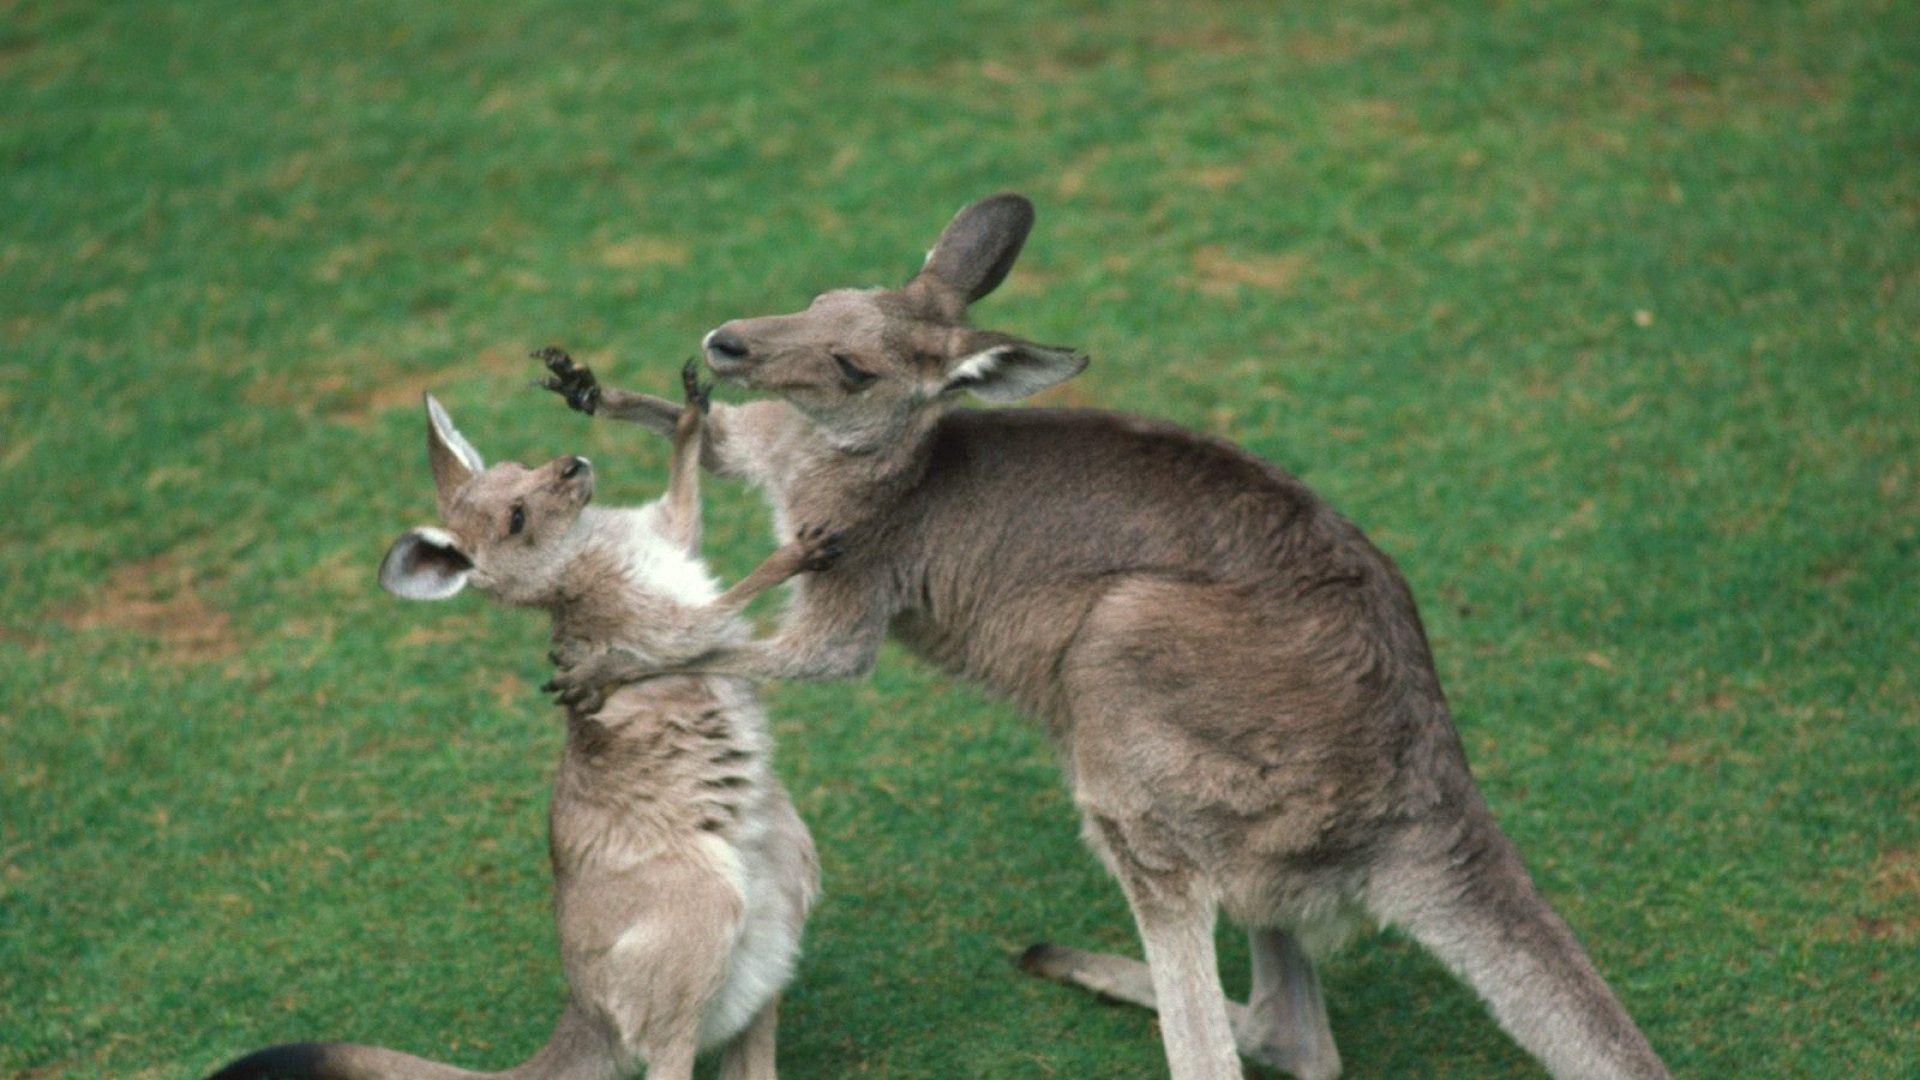 Photo With A Baby Kangaroo